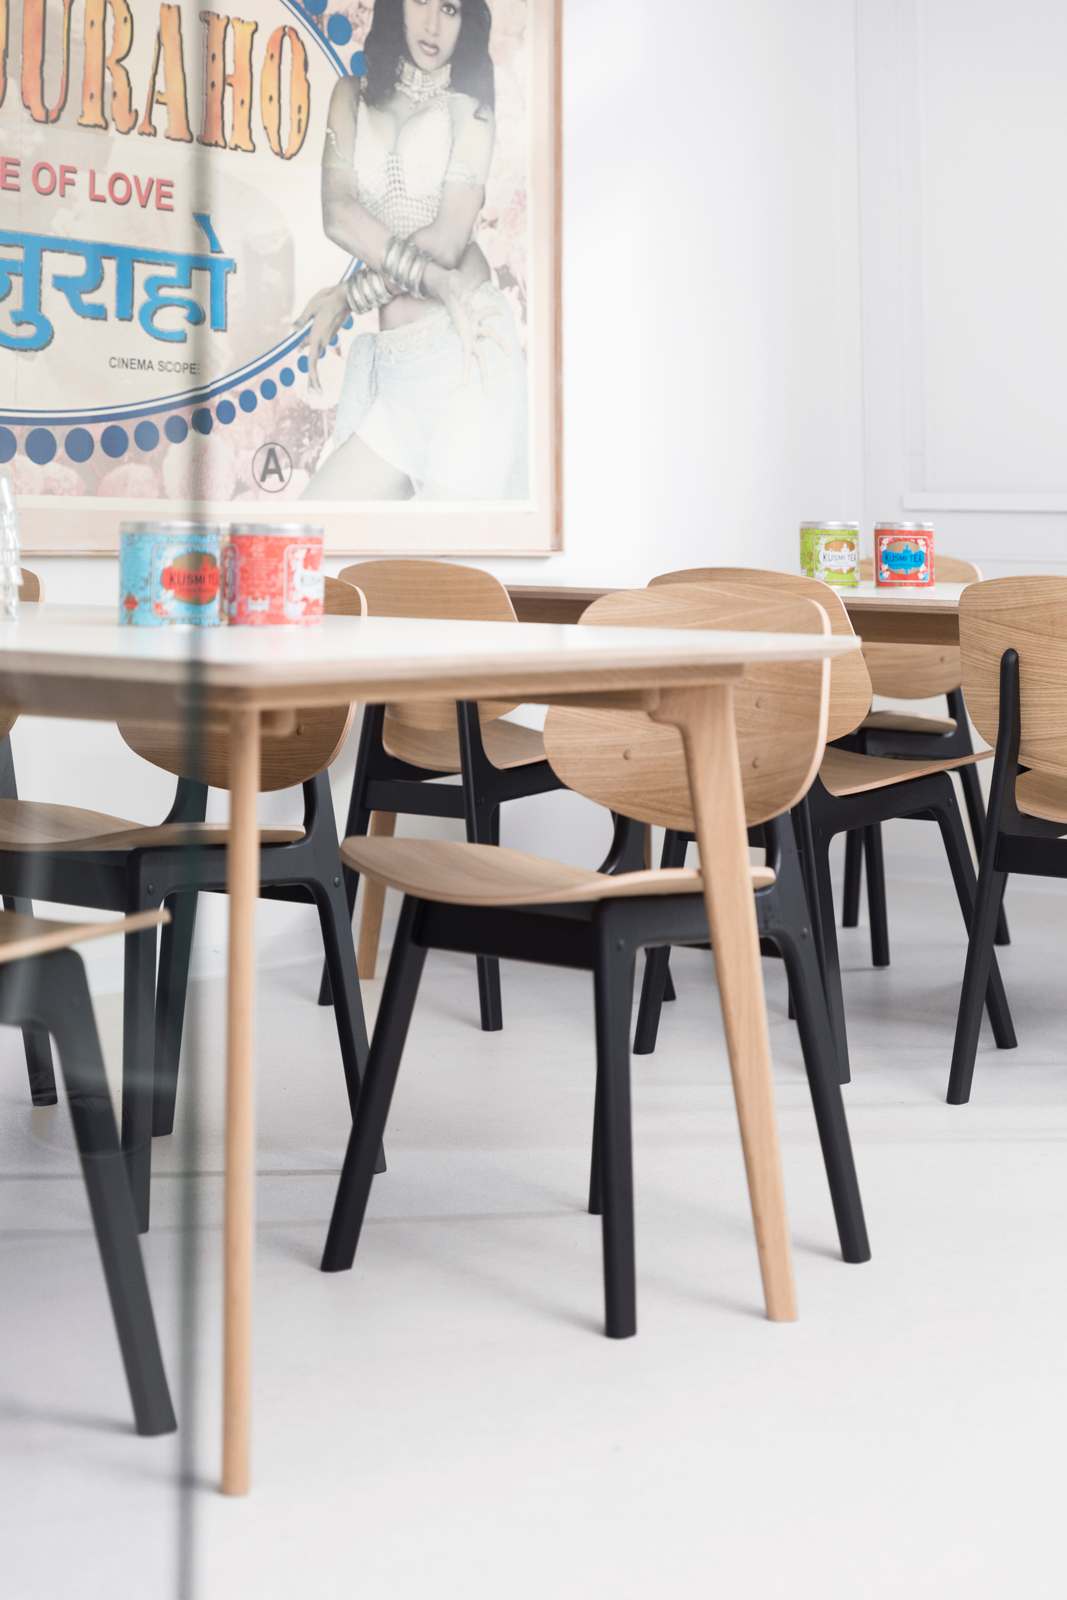 True_North_Designs_Pandora_Chair_Staff_Restaurant_Design_Carsten_Buhl_Bollywood_Poster_02 - Kopi.jpg